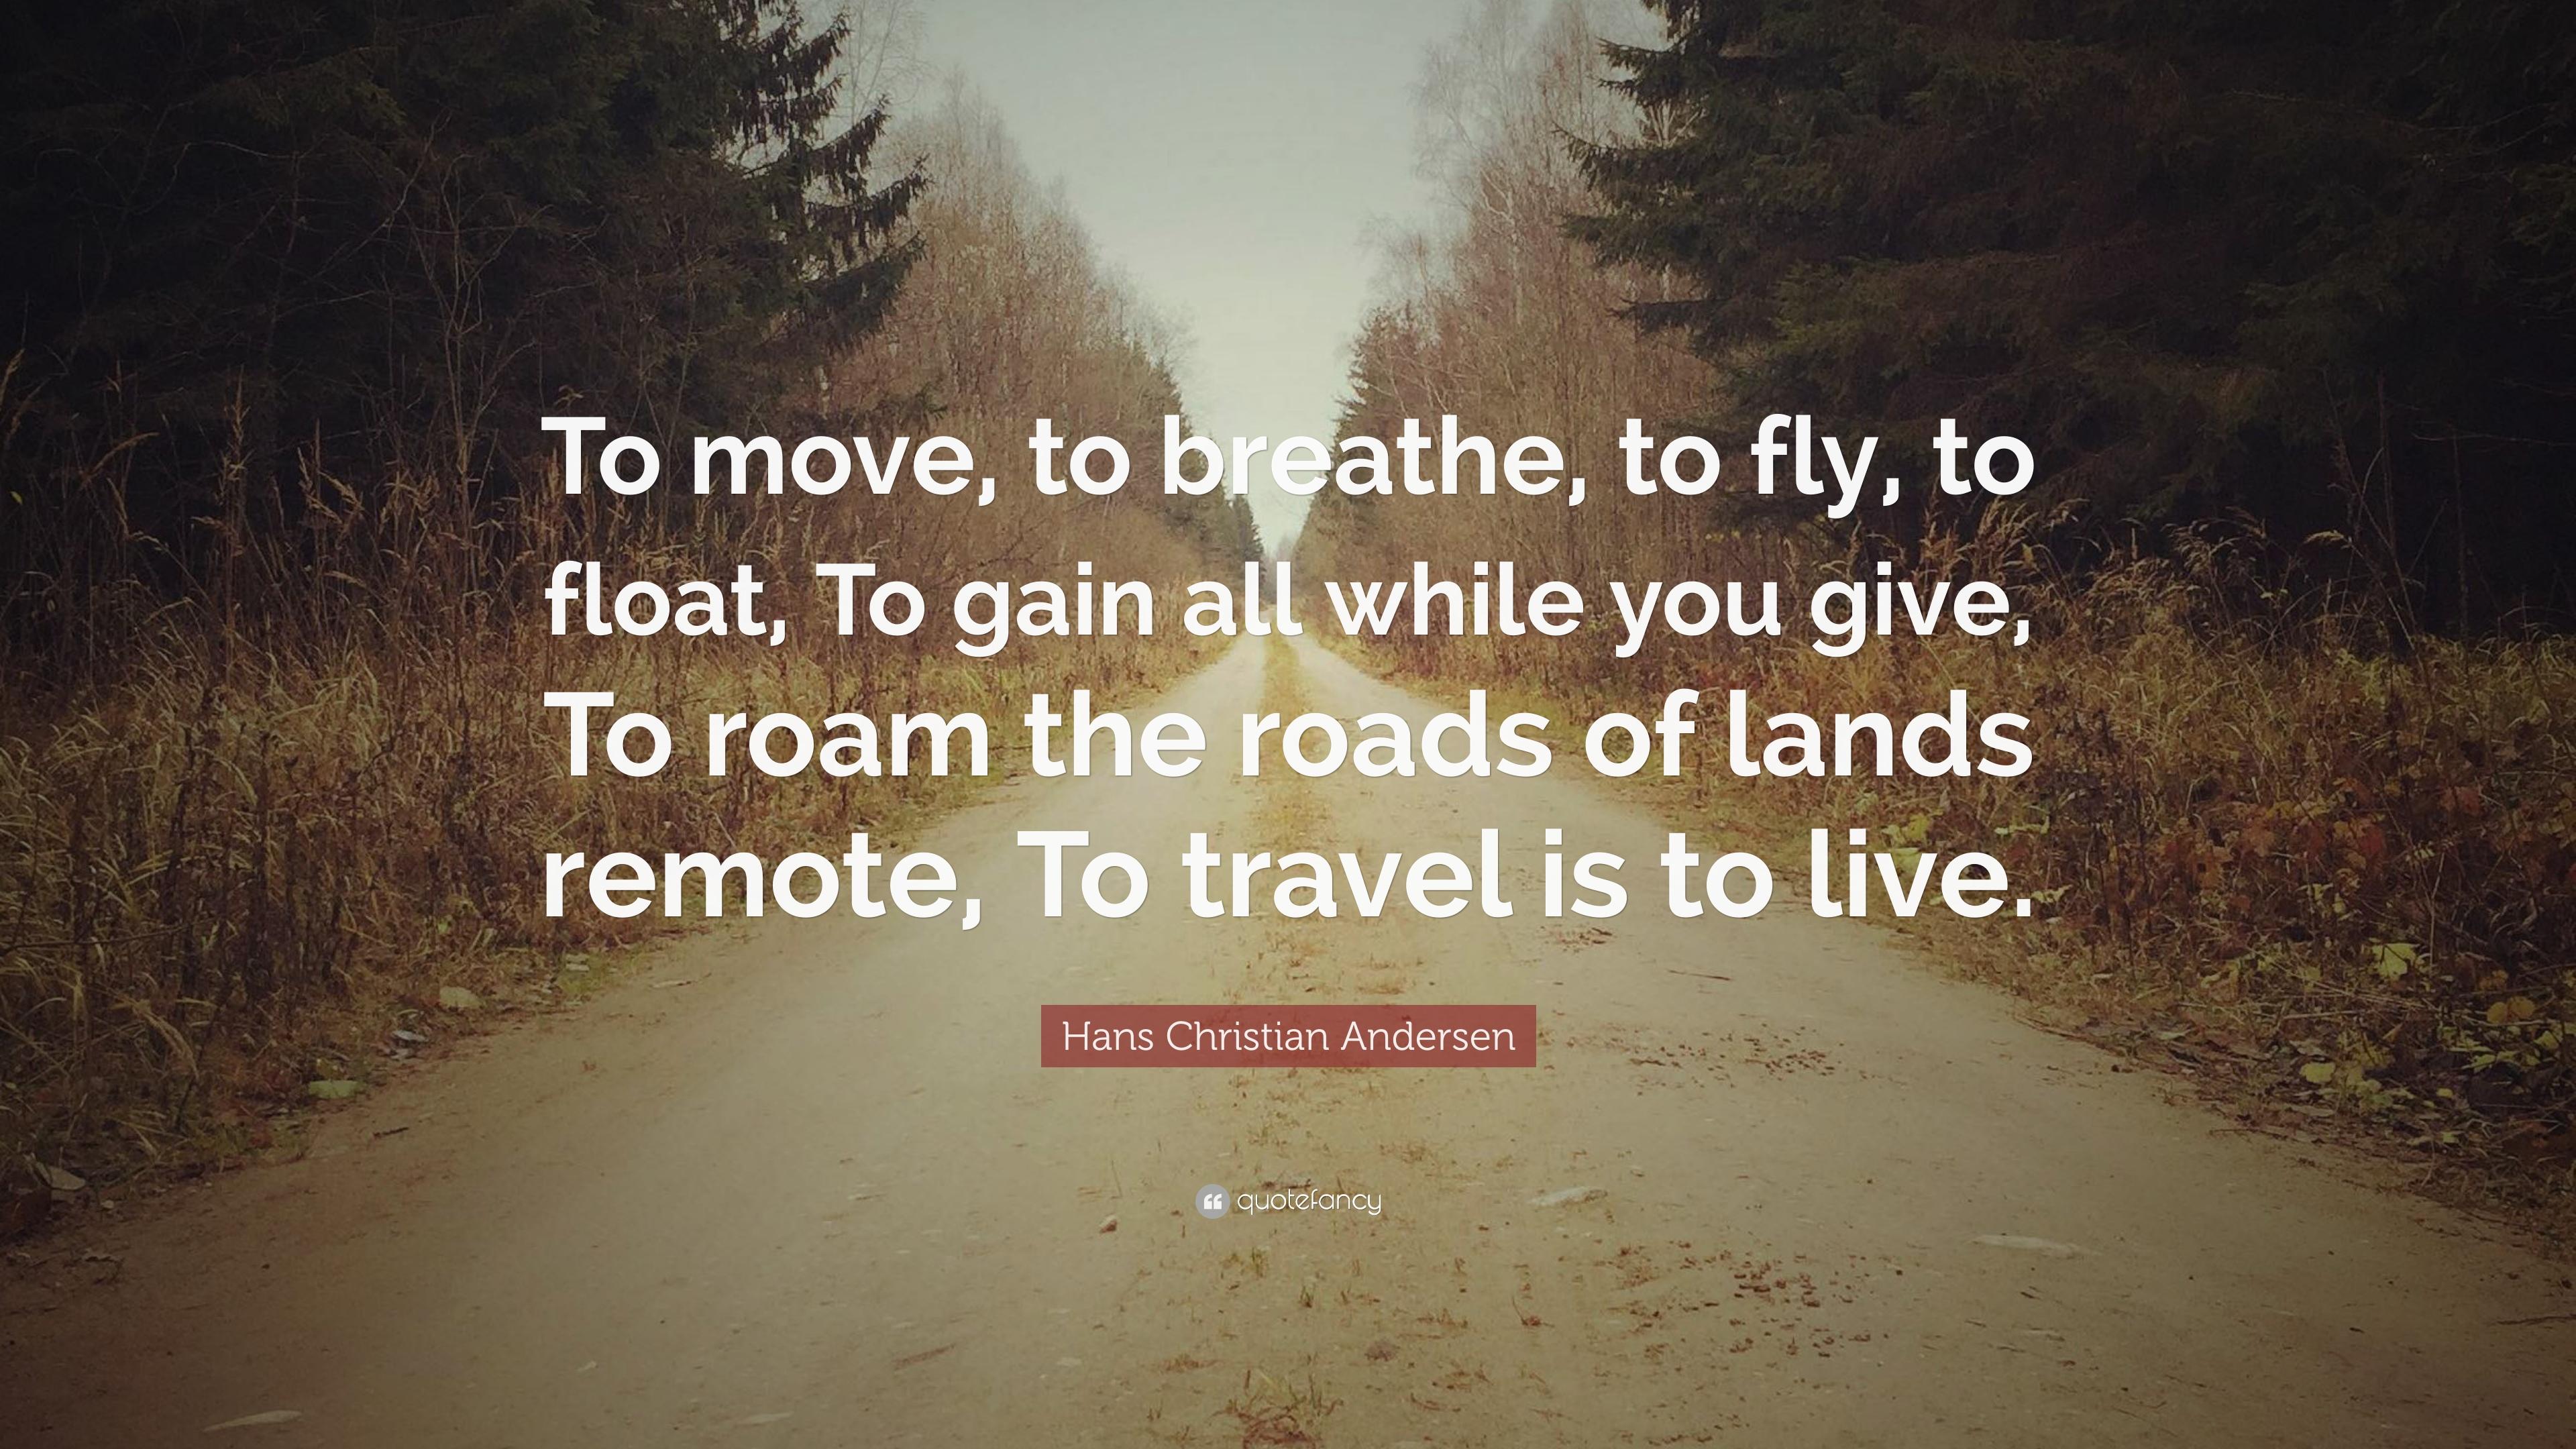 Hans Christian Andersen Travel Quote Tumblr thumbnail